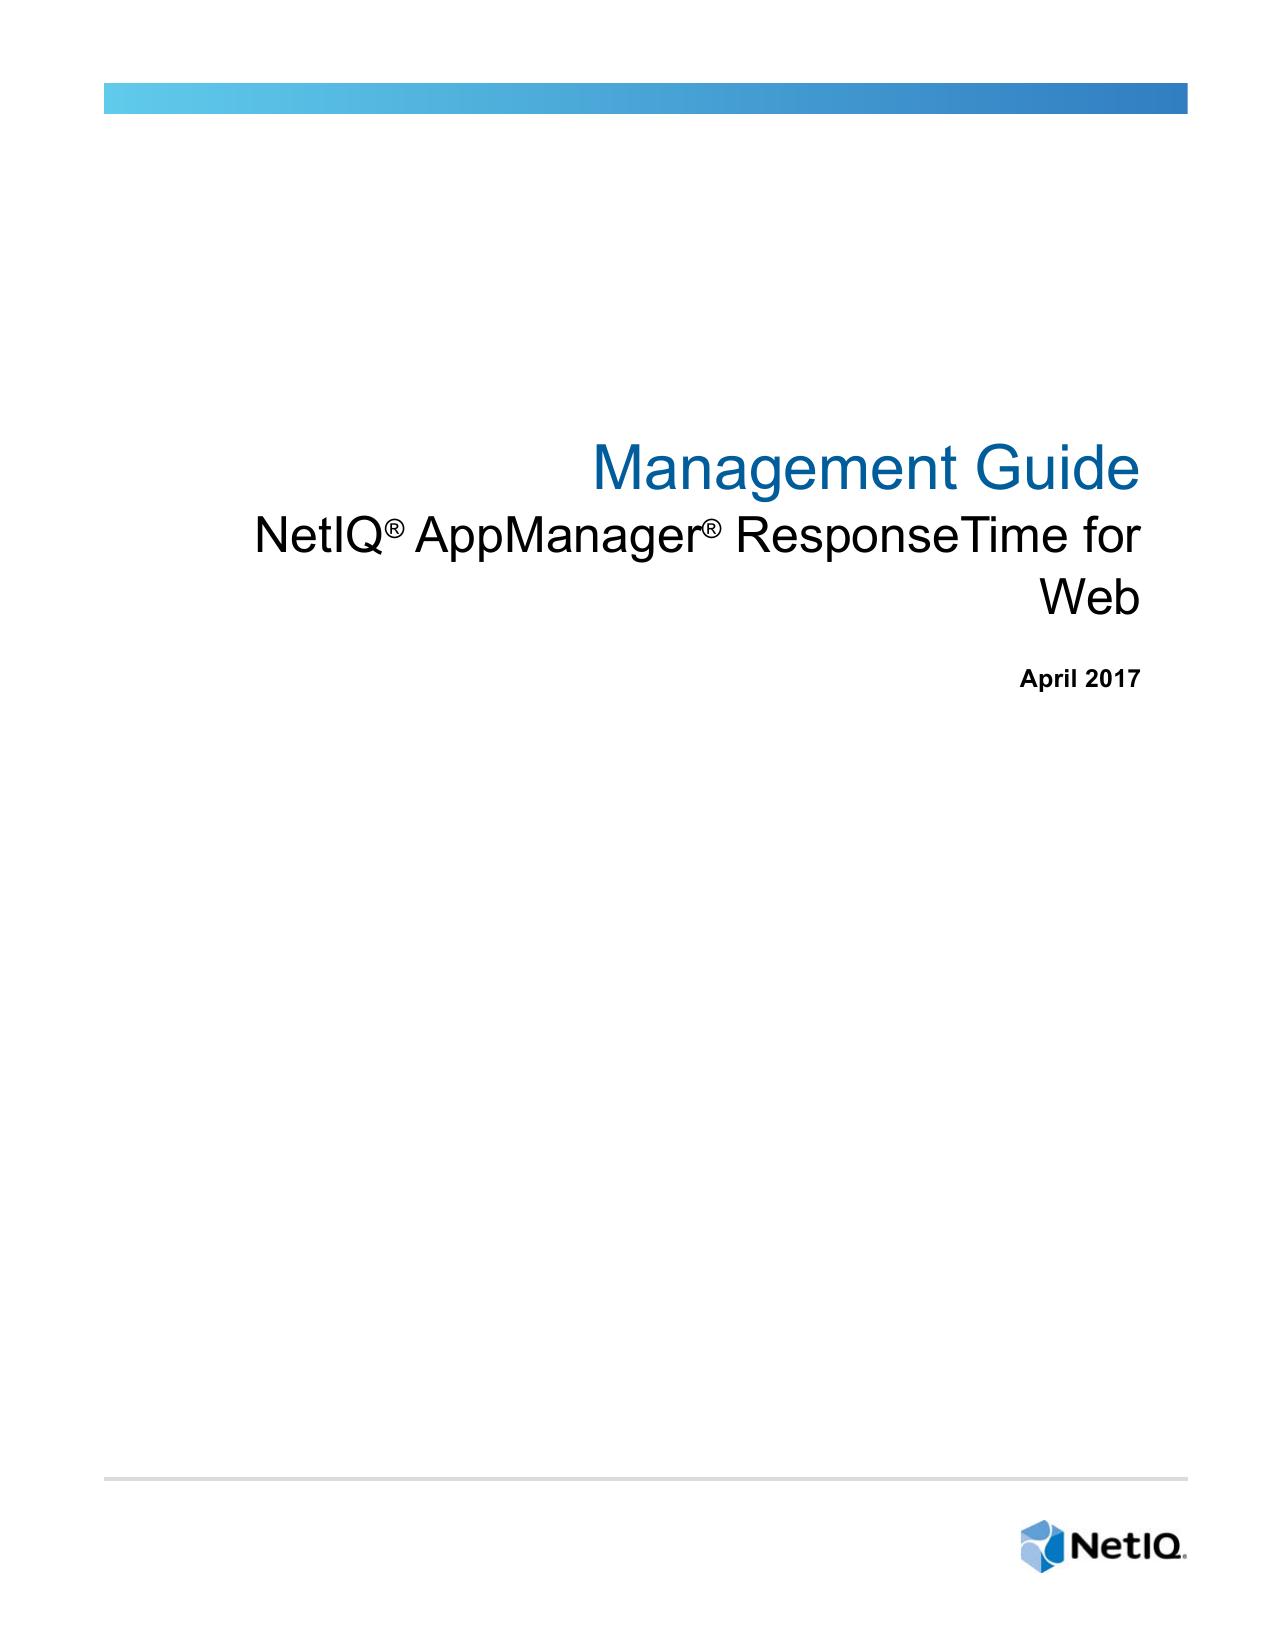 NetIQ AppManager ResponseTime for Web Management Guide   Manualzz